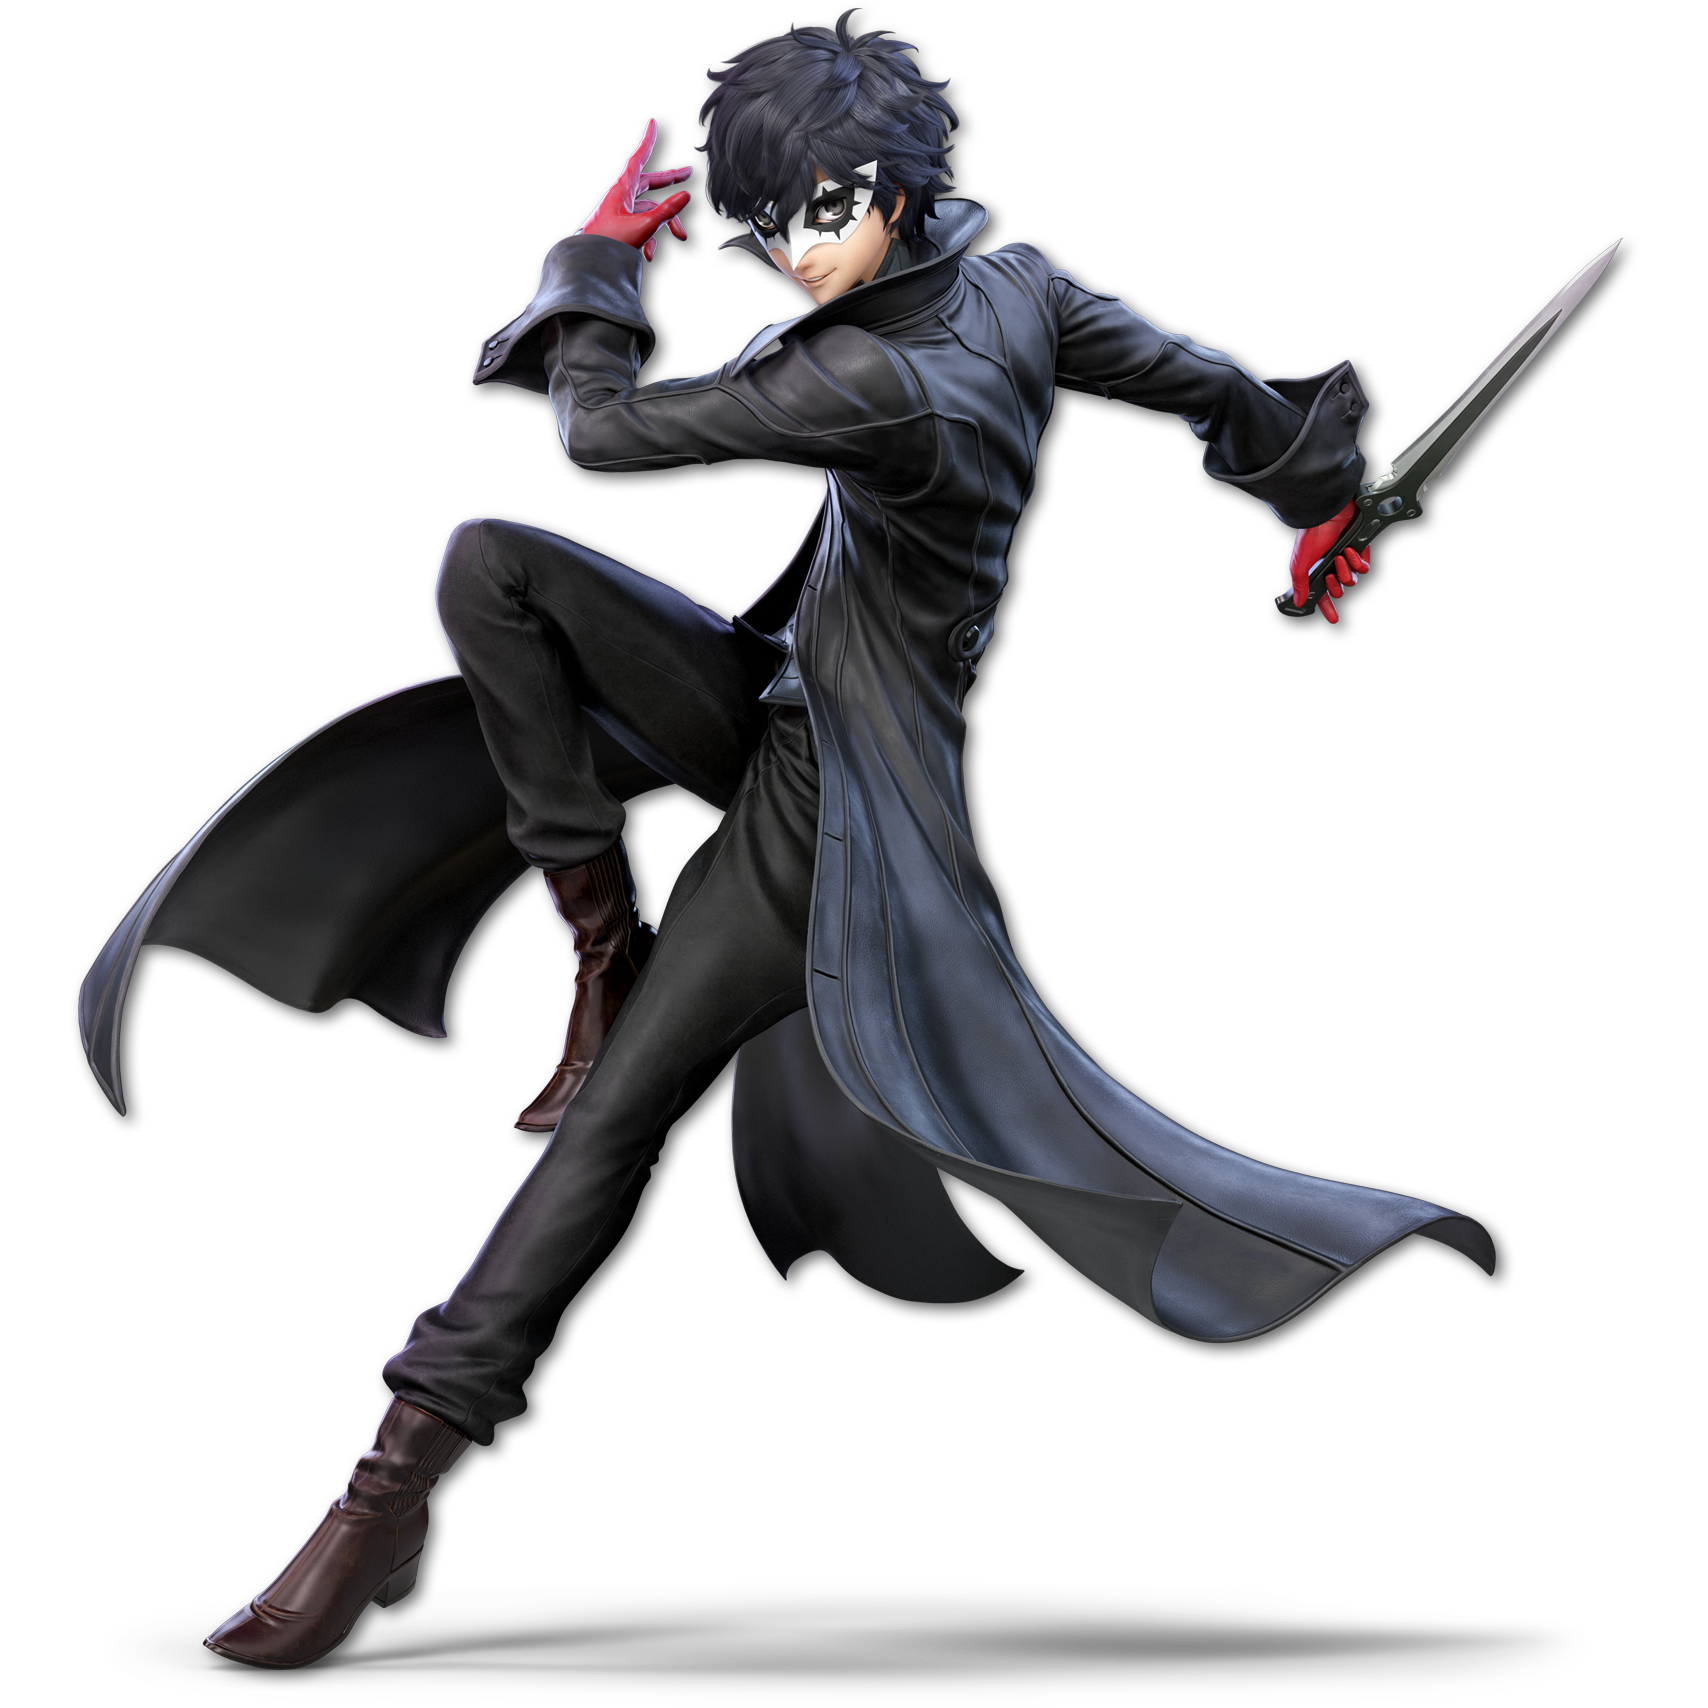 Joker (Super Smash Bros  Ultimate) | Smashpedia | FANDOM powered by